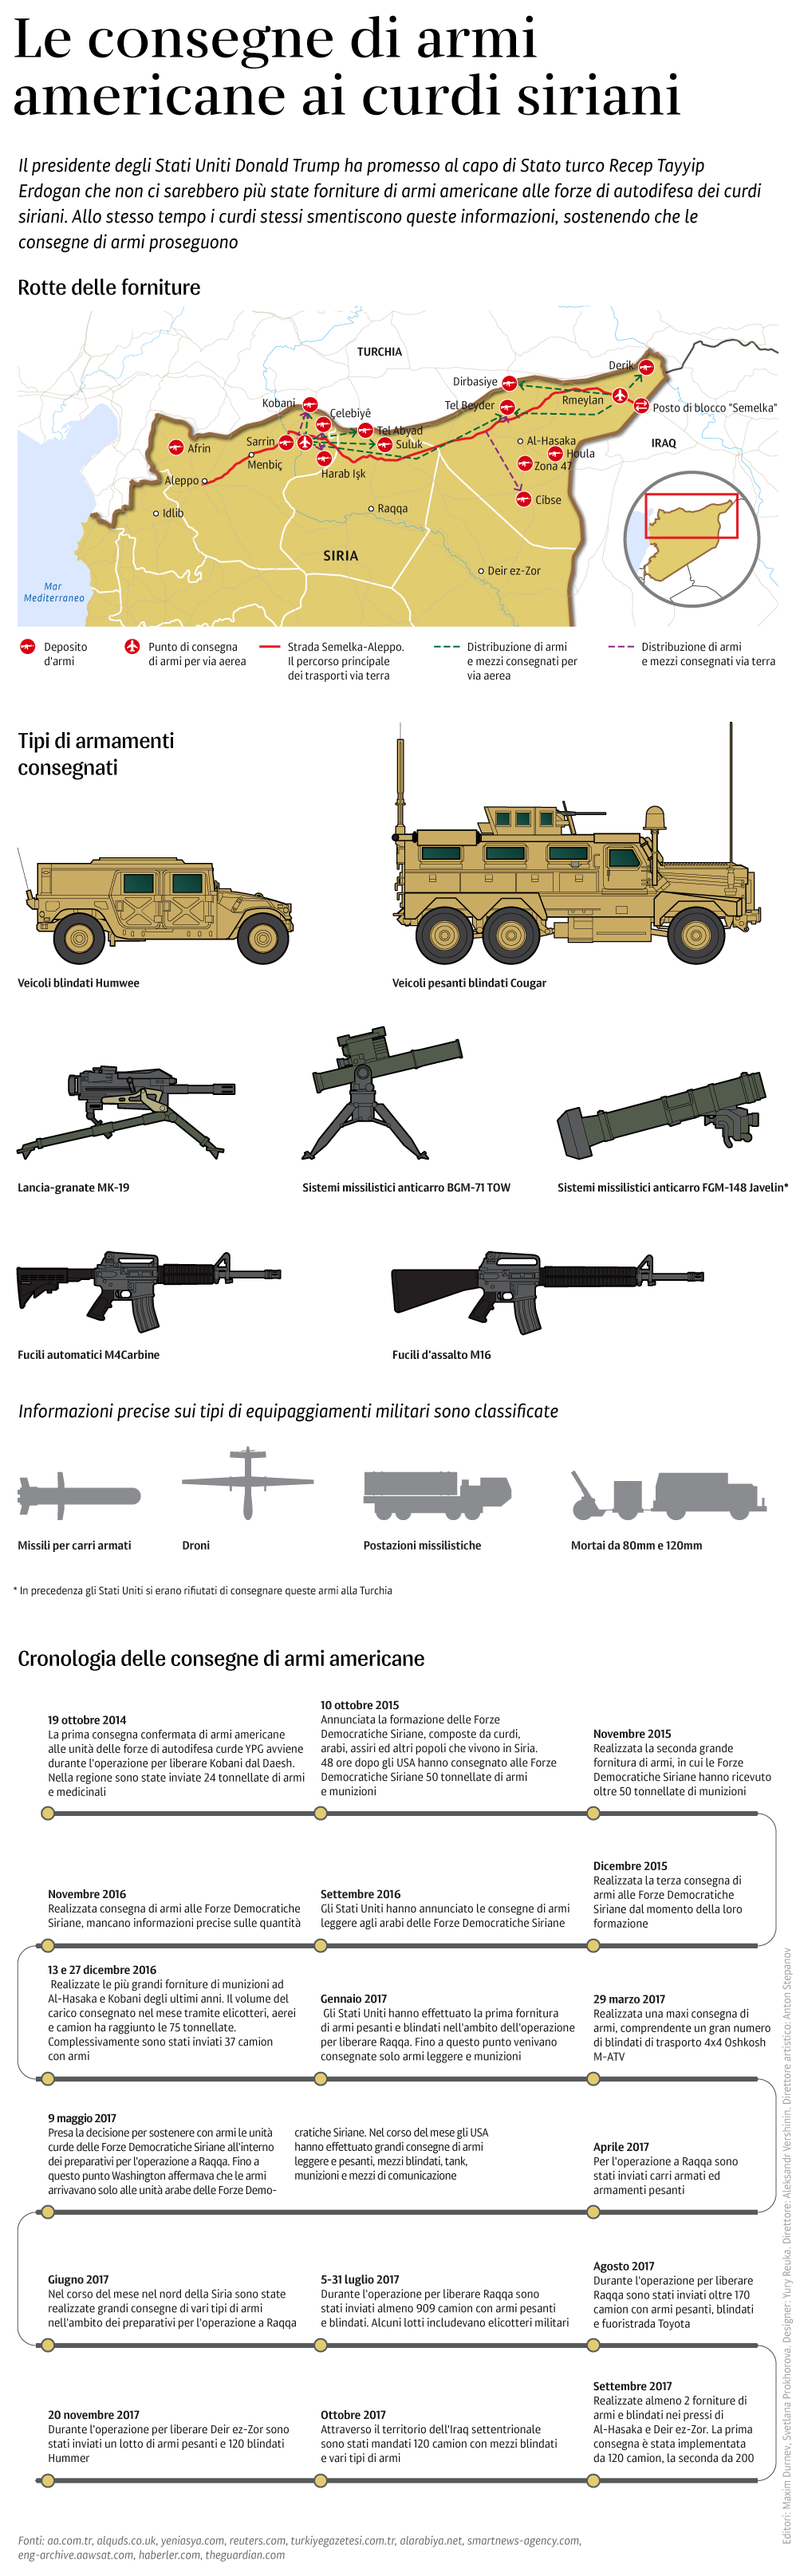 Le consegne di armi americane ai curdi siriani - Sputnik Italia